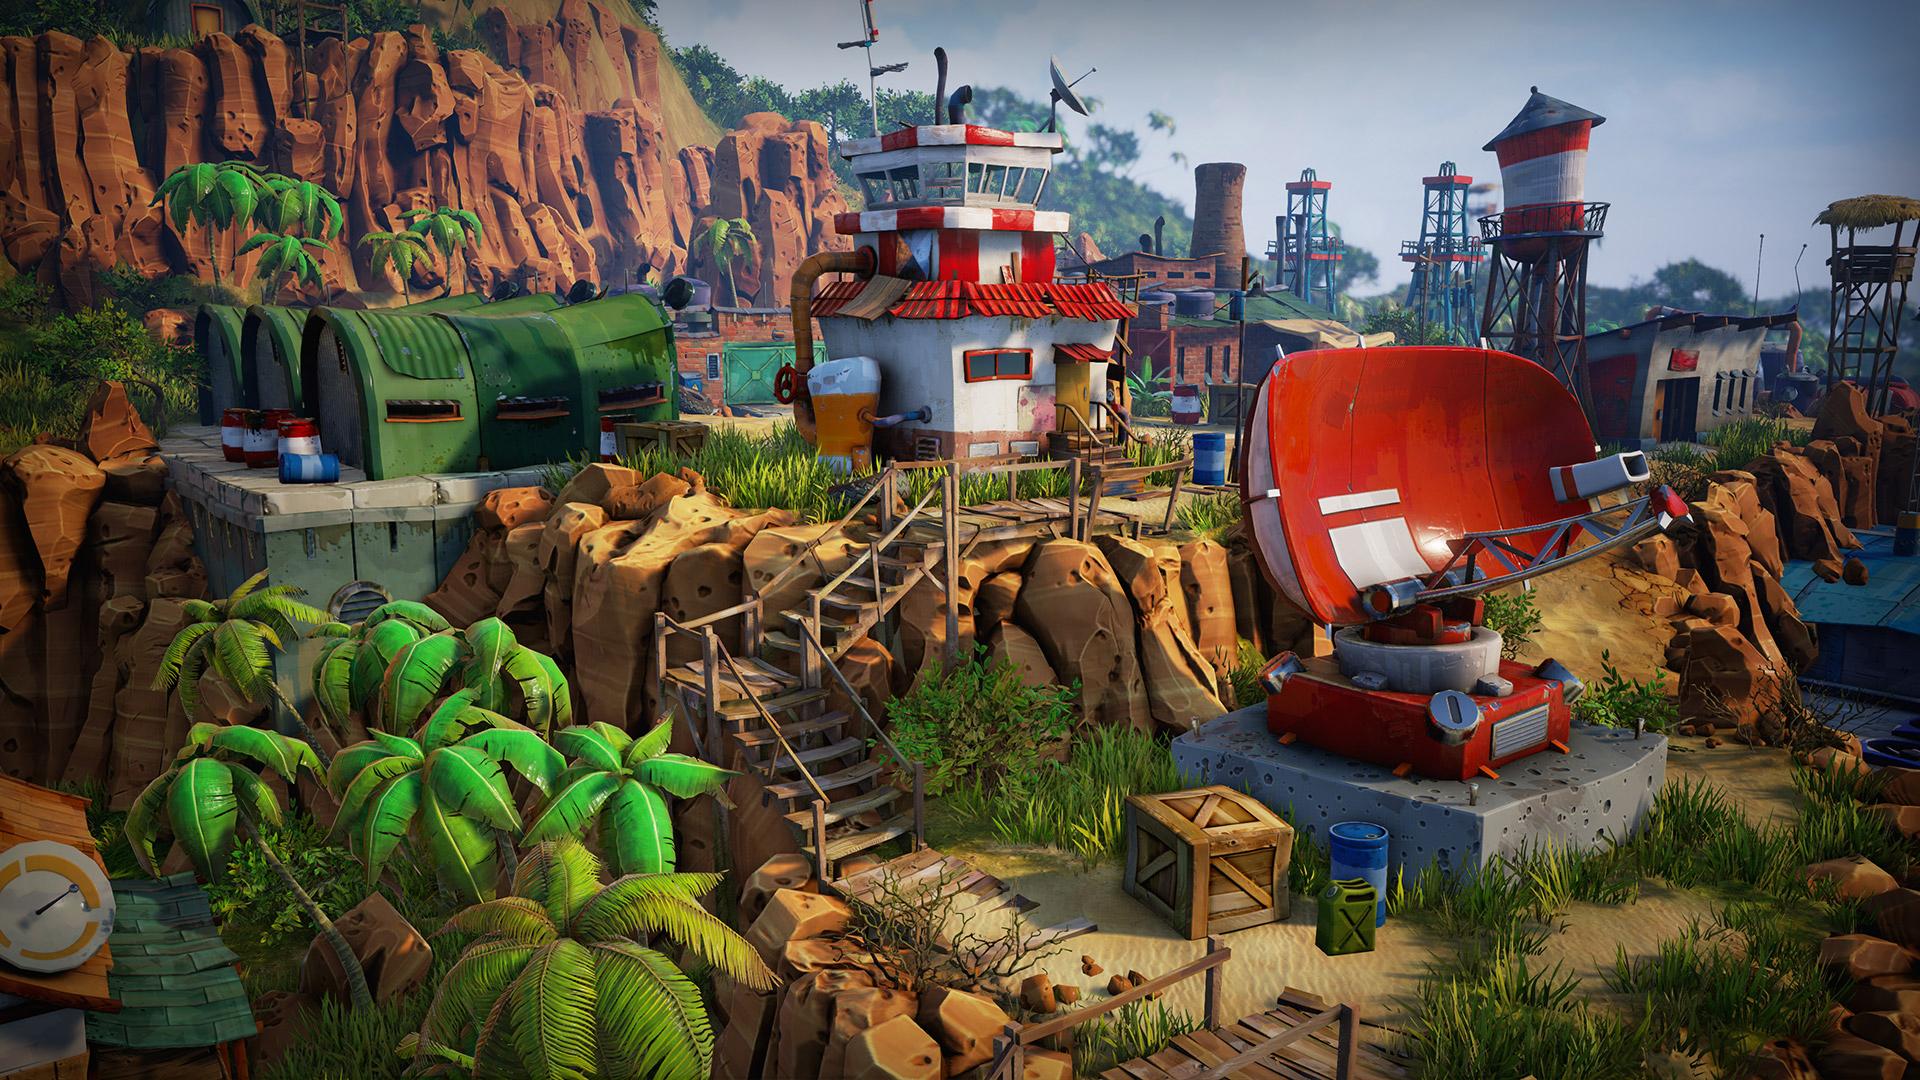 JungleBase Environment